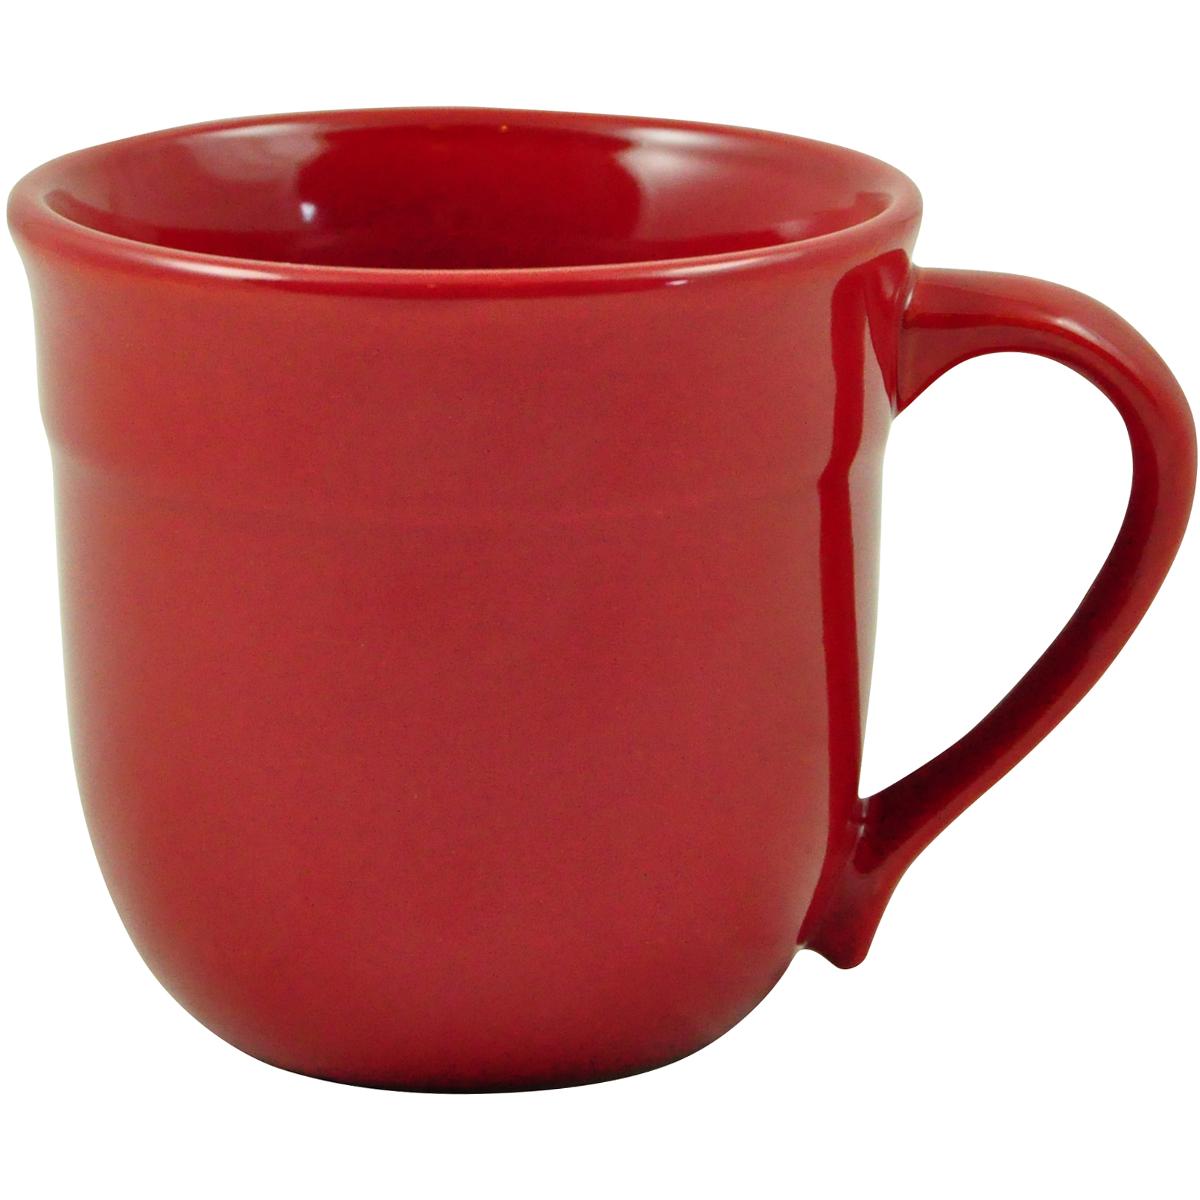 Emile Henry HR Burgundy Ceramic 13.5 Ounce Traditional Mug